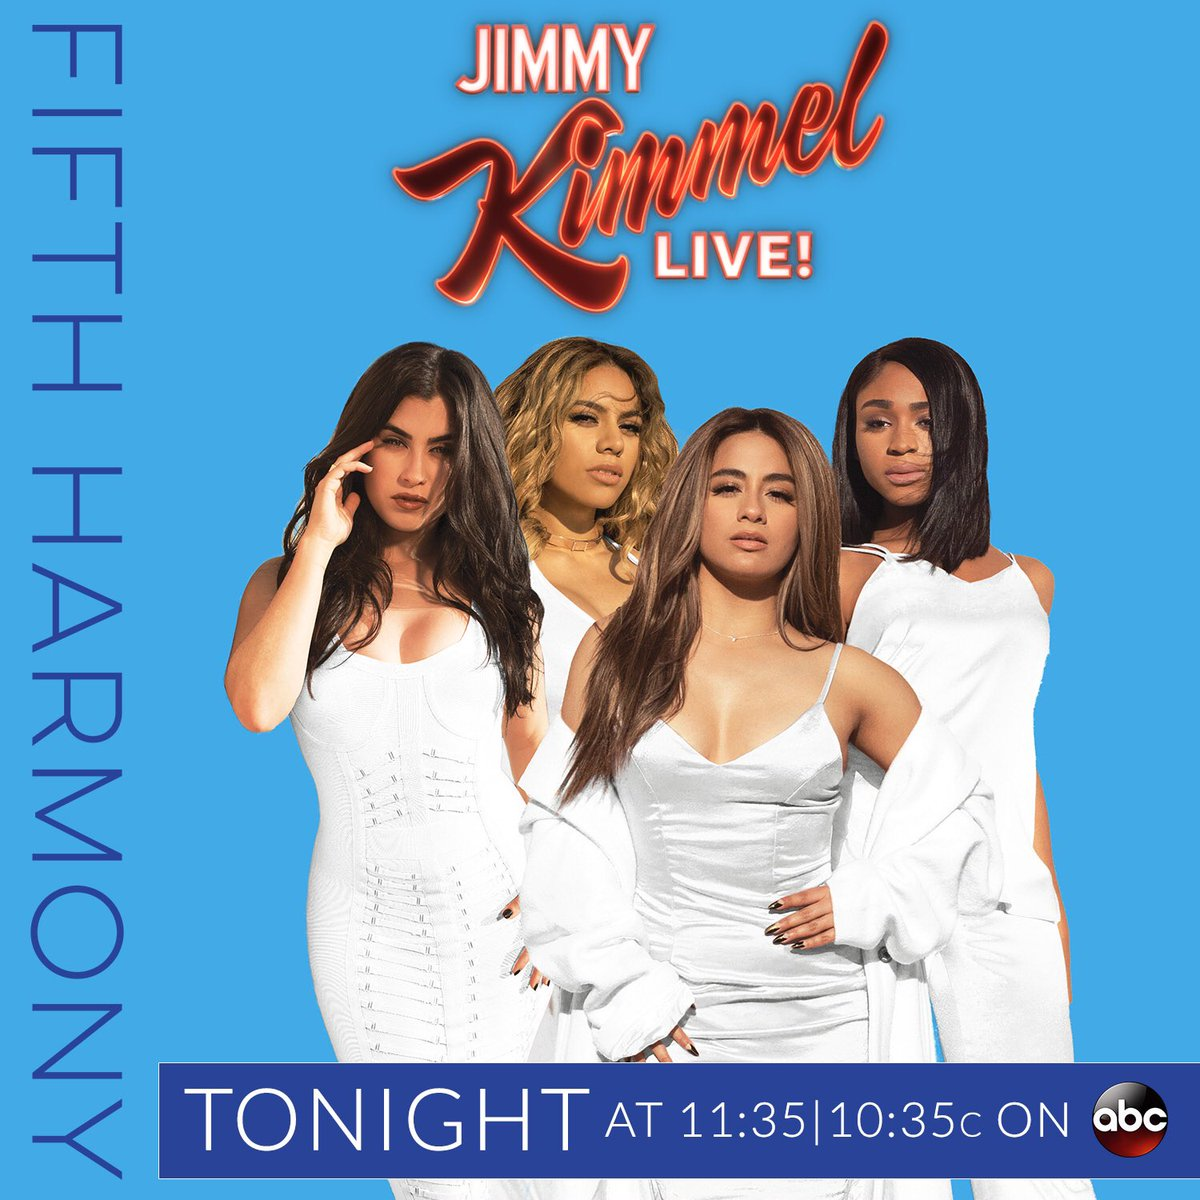 TONIGHT! Dont miss @FifthHarmony on @Jim...